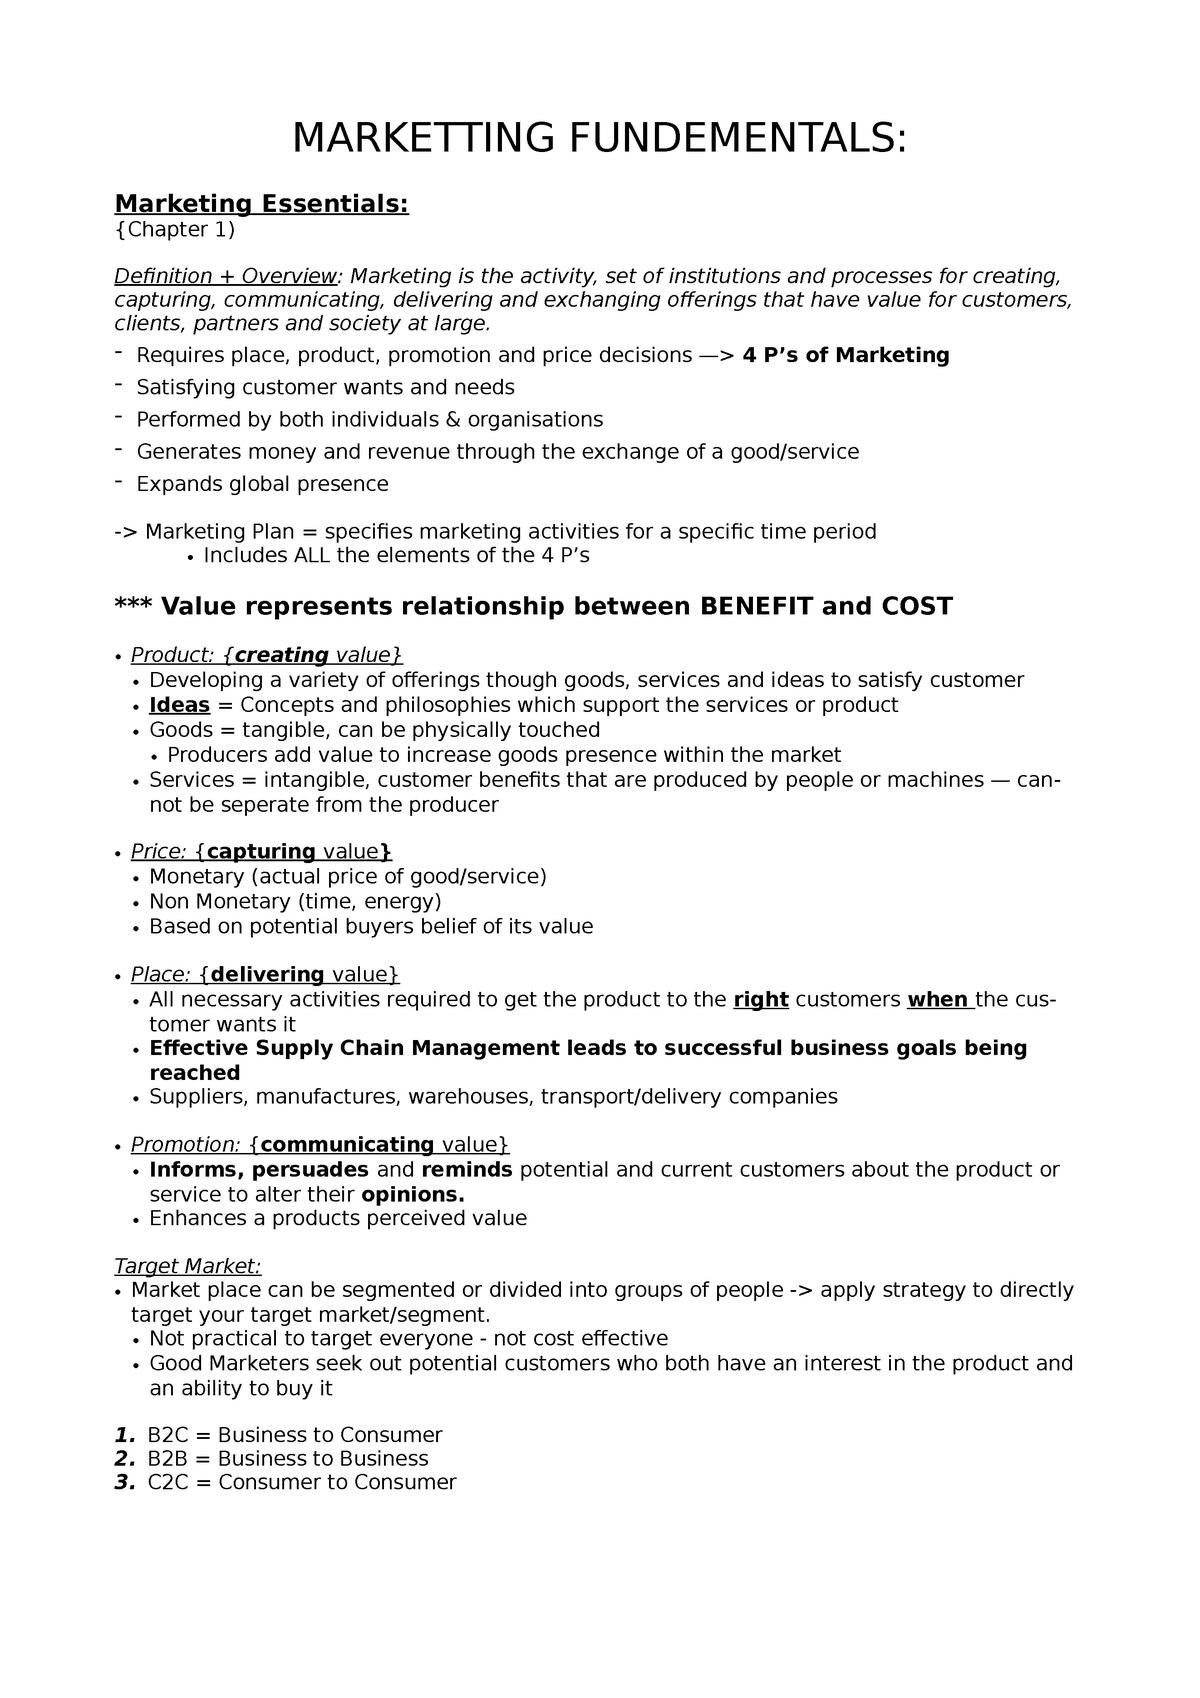 Marketting Fundementals - MARK1012: Marketing Fundamentals